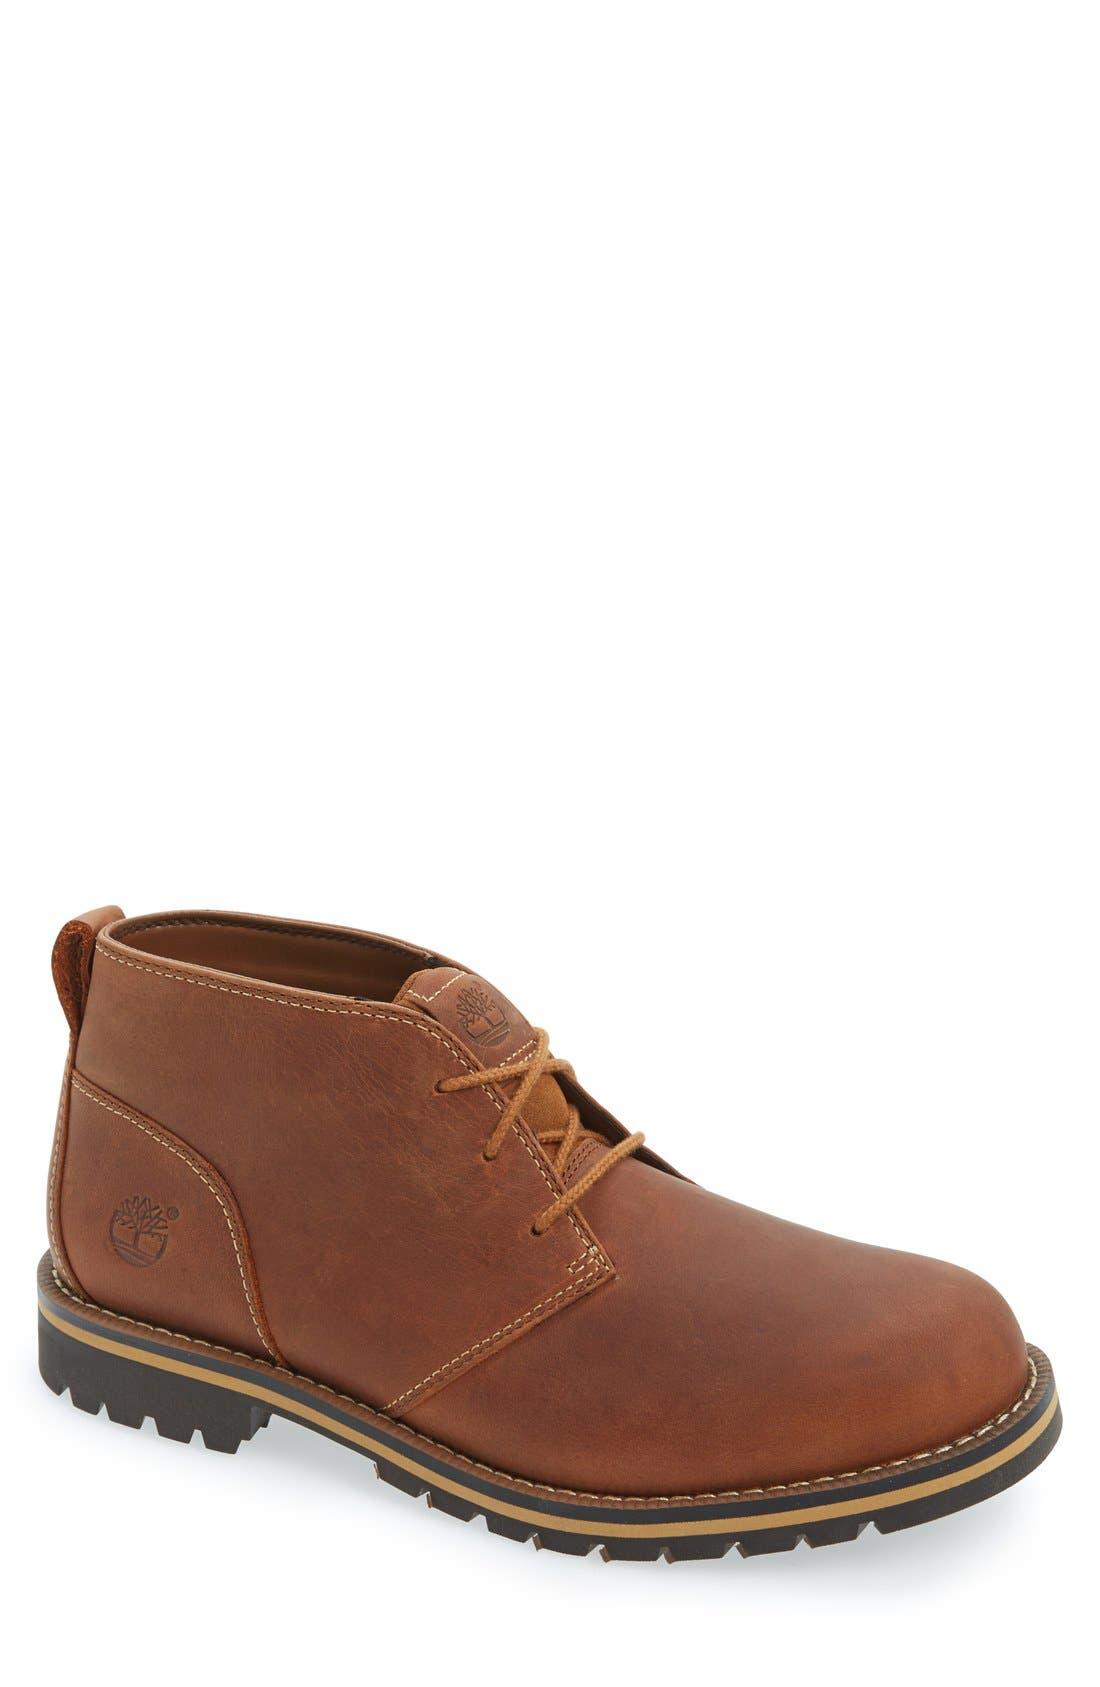 TIMBERLAND 'Grantly' Chukka Boot, Main, color, 200